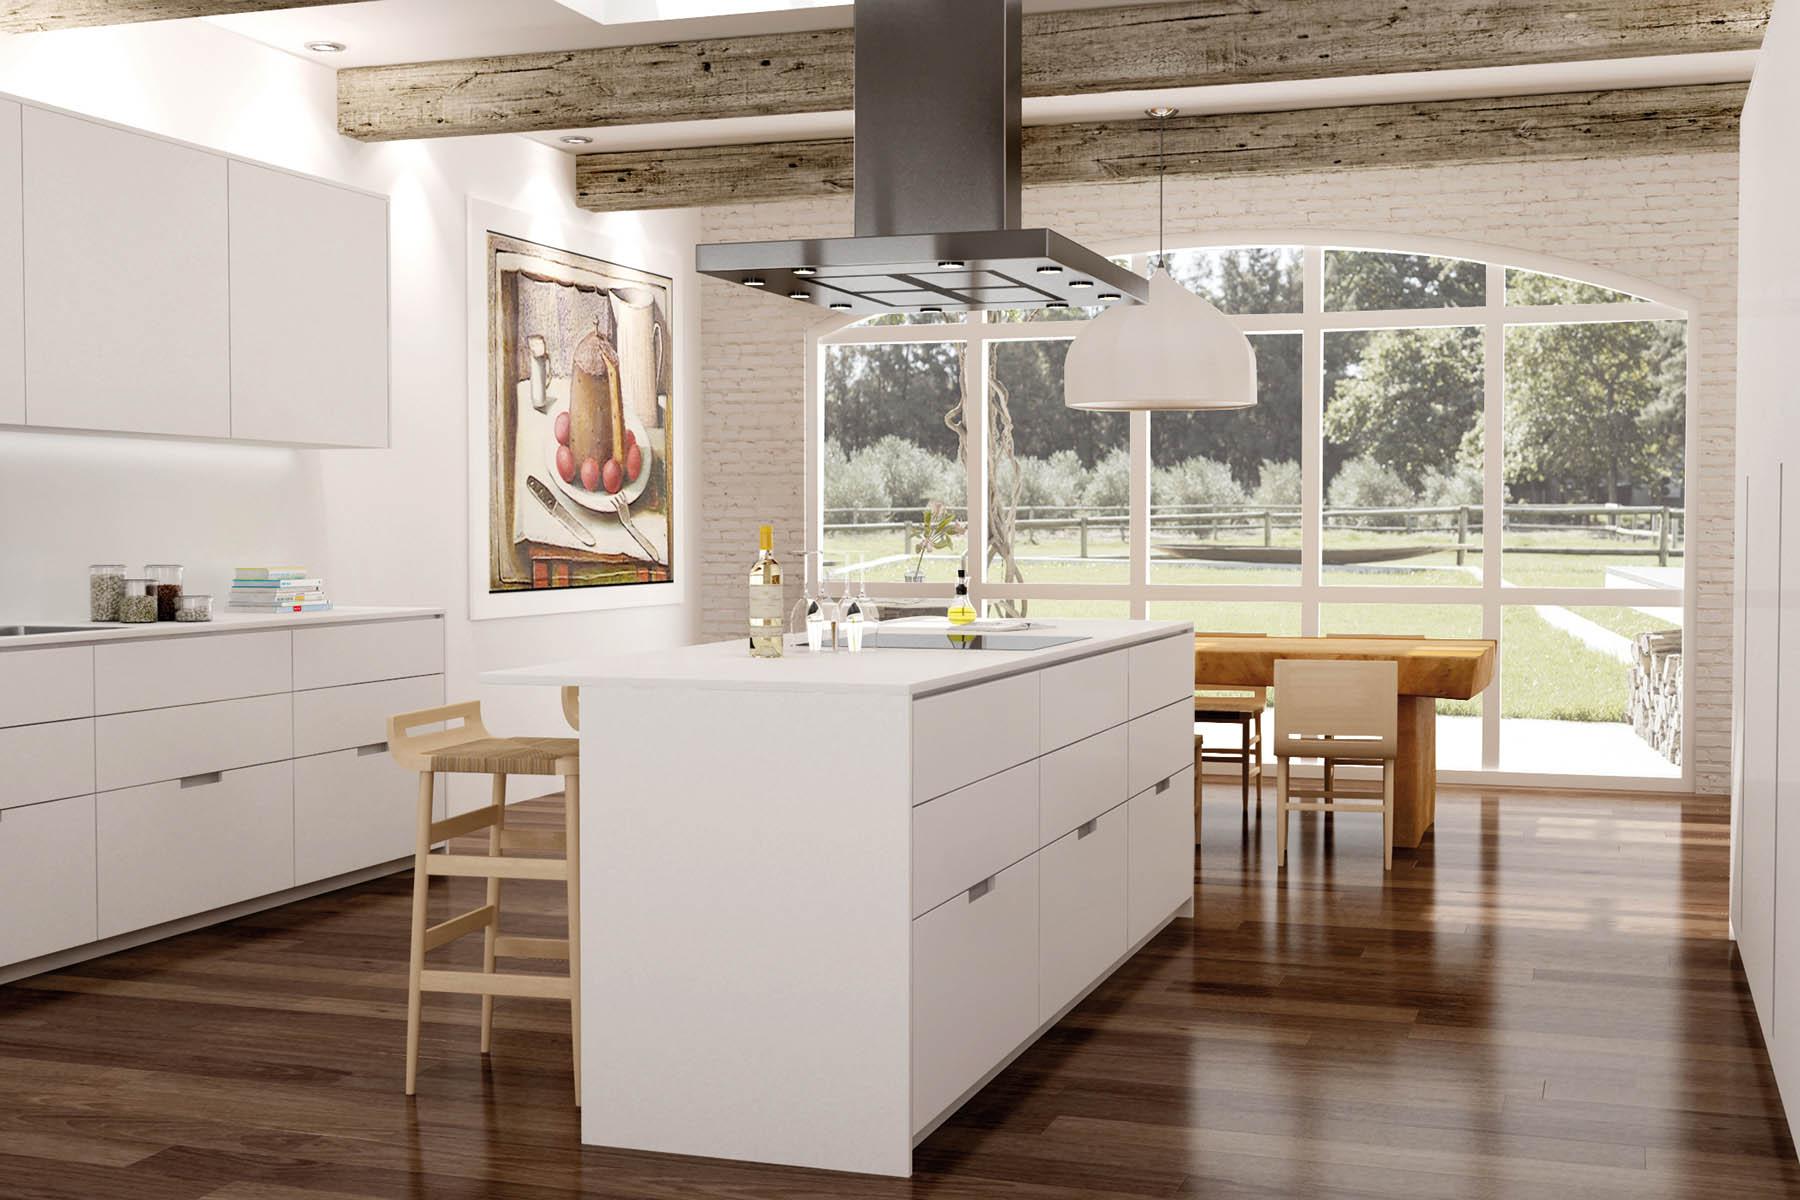 Cocinas Logos NEXT - Muebles de cocina para cocinas modernas y ...